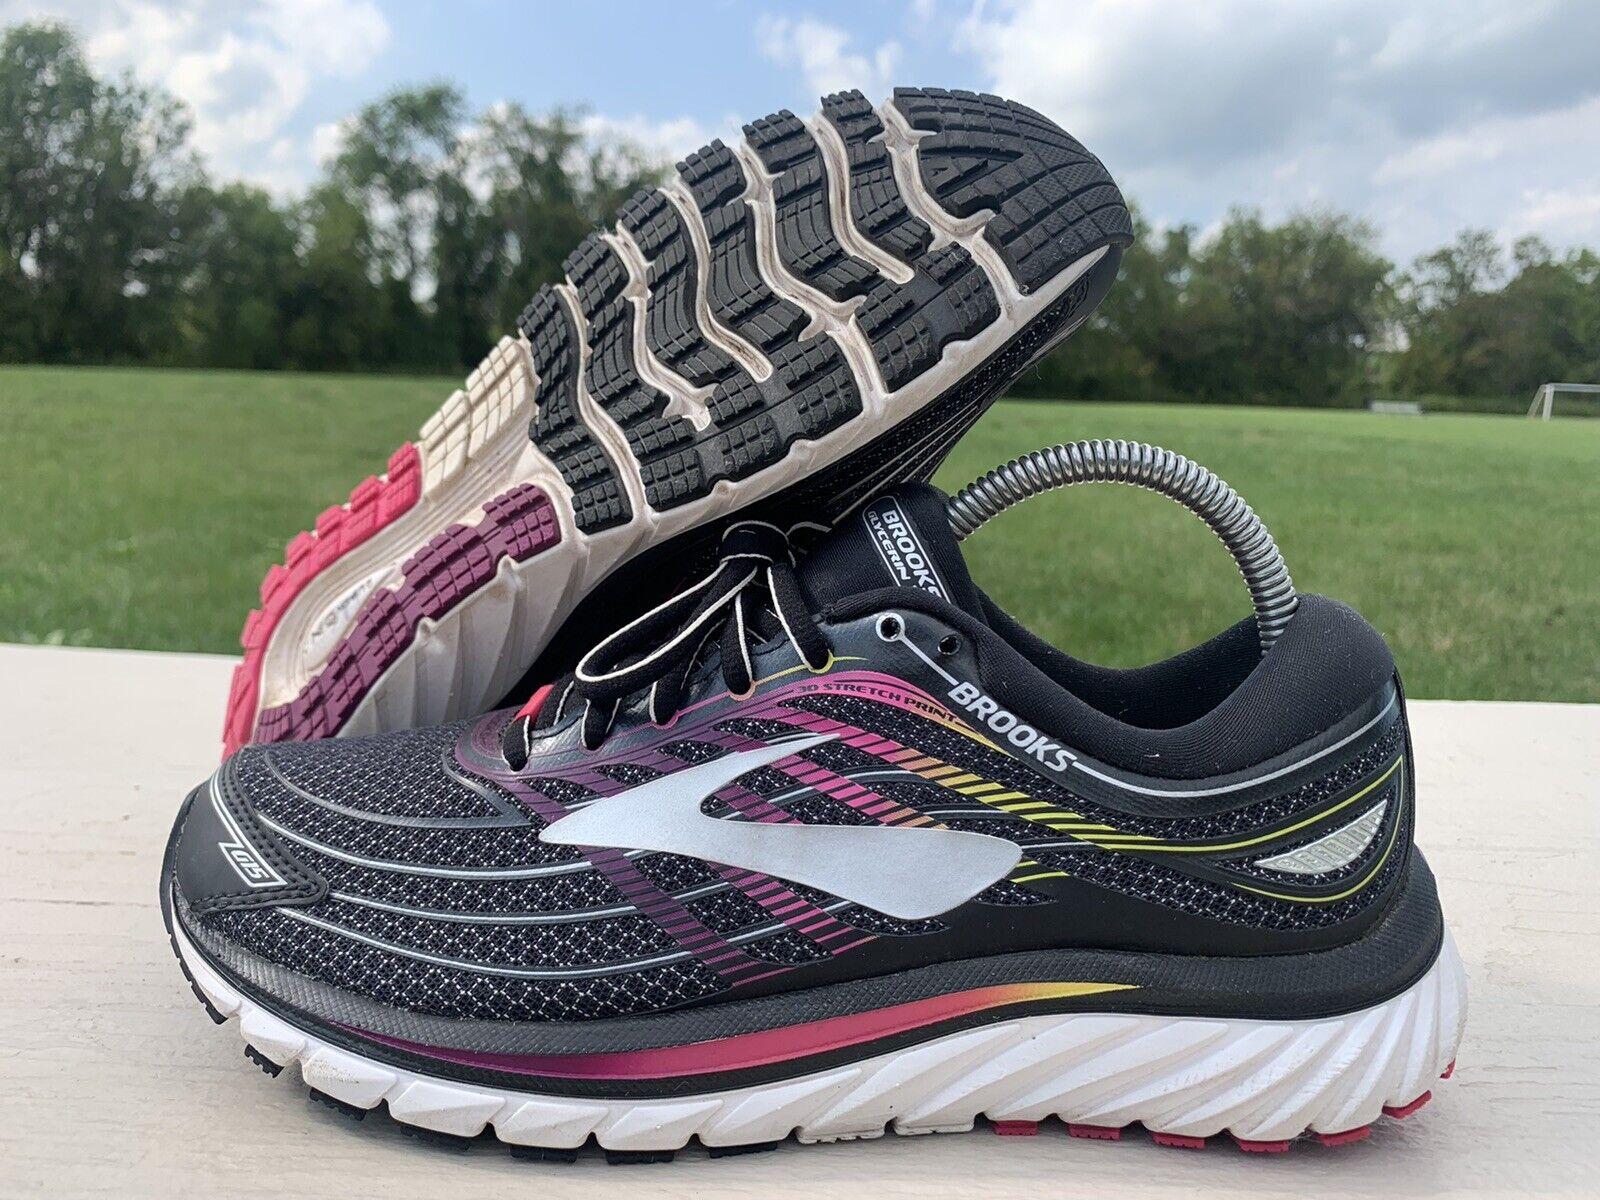 Brooks Ravenna 4 Women's Running Shoes